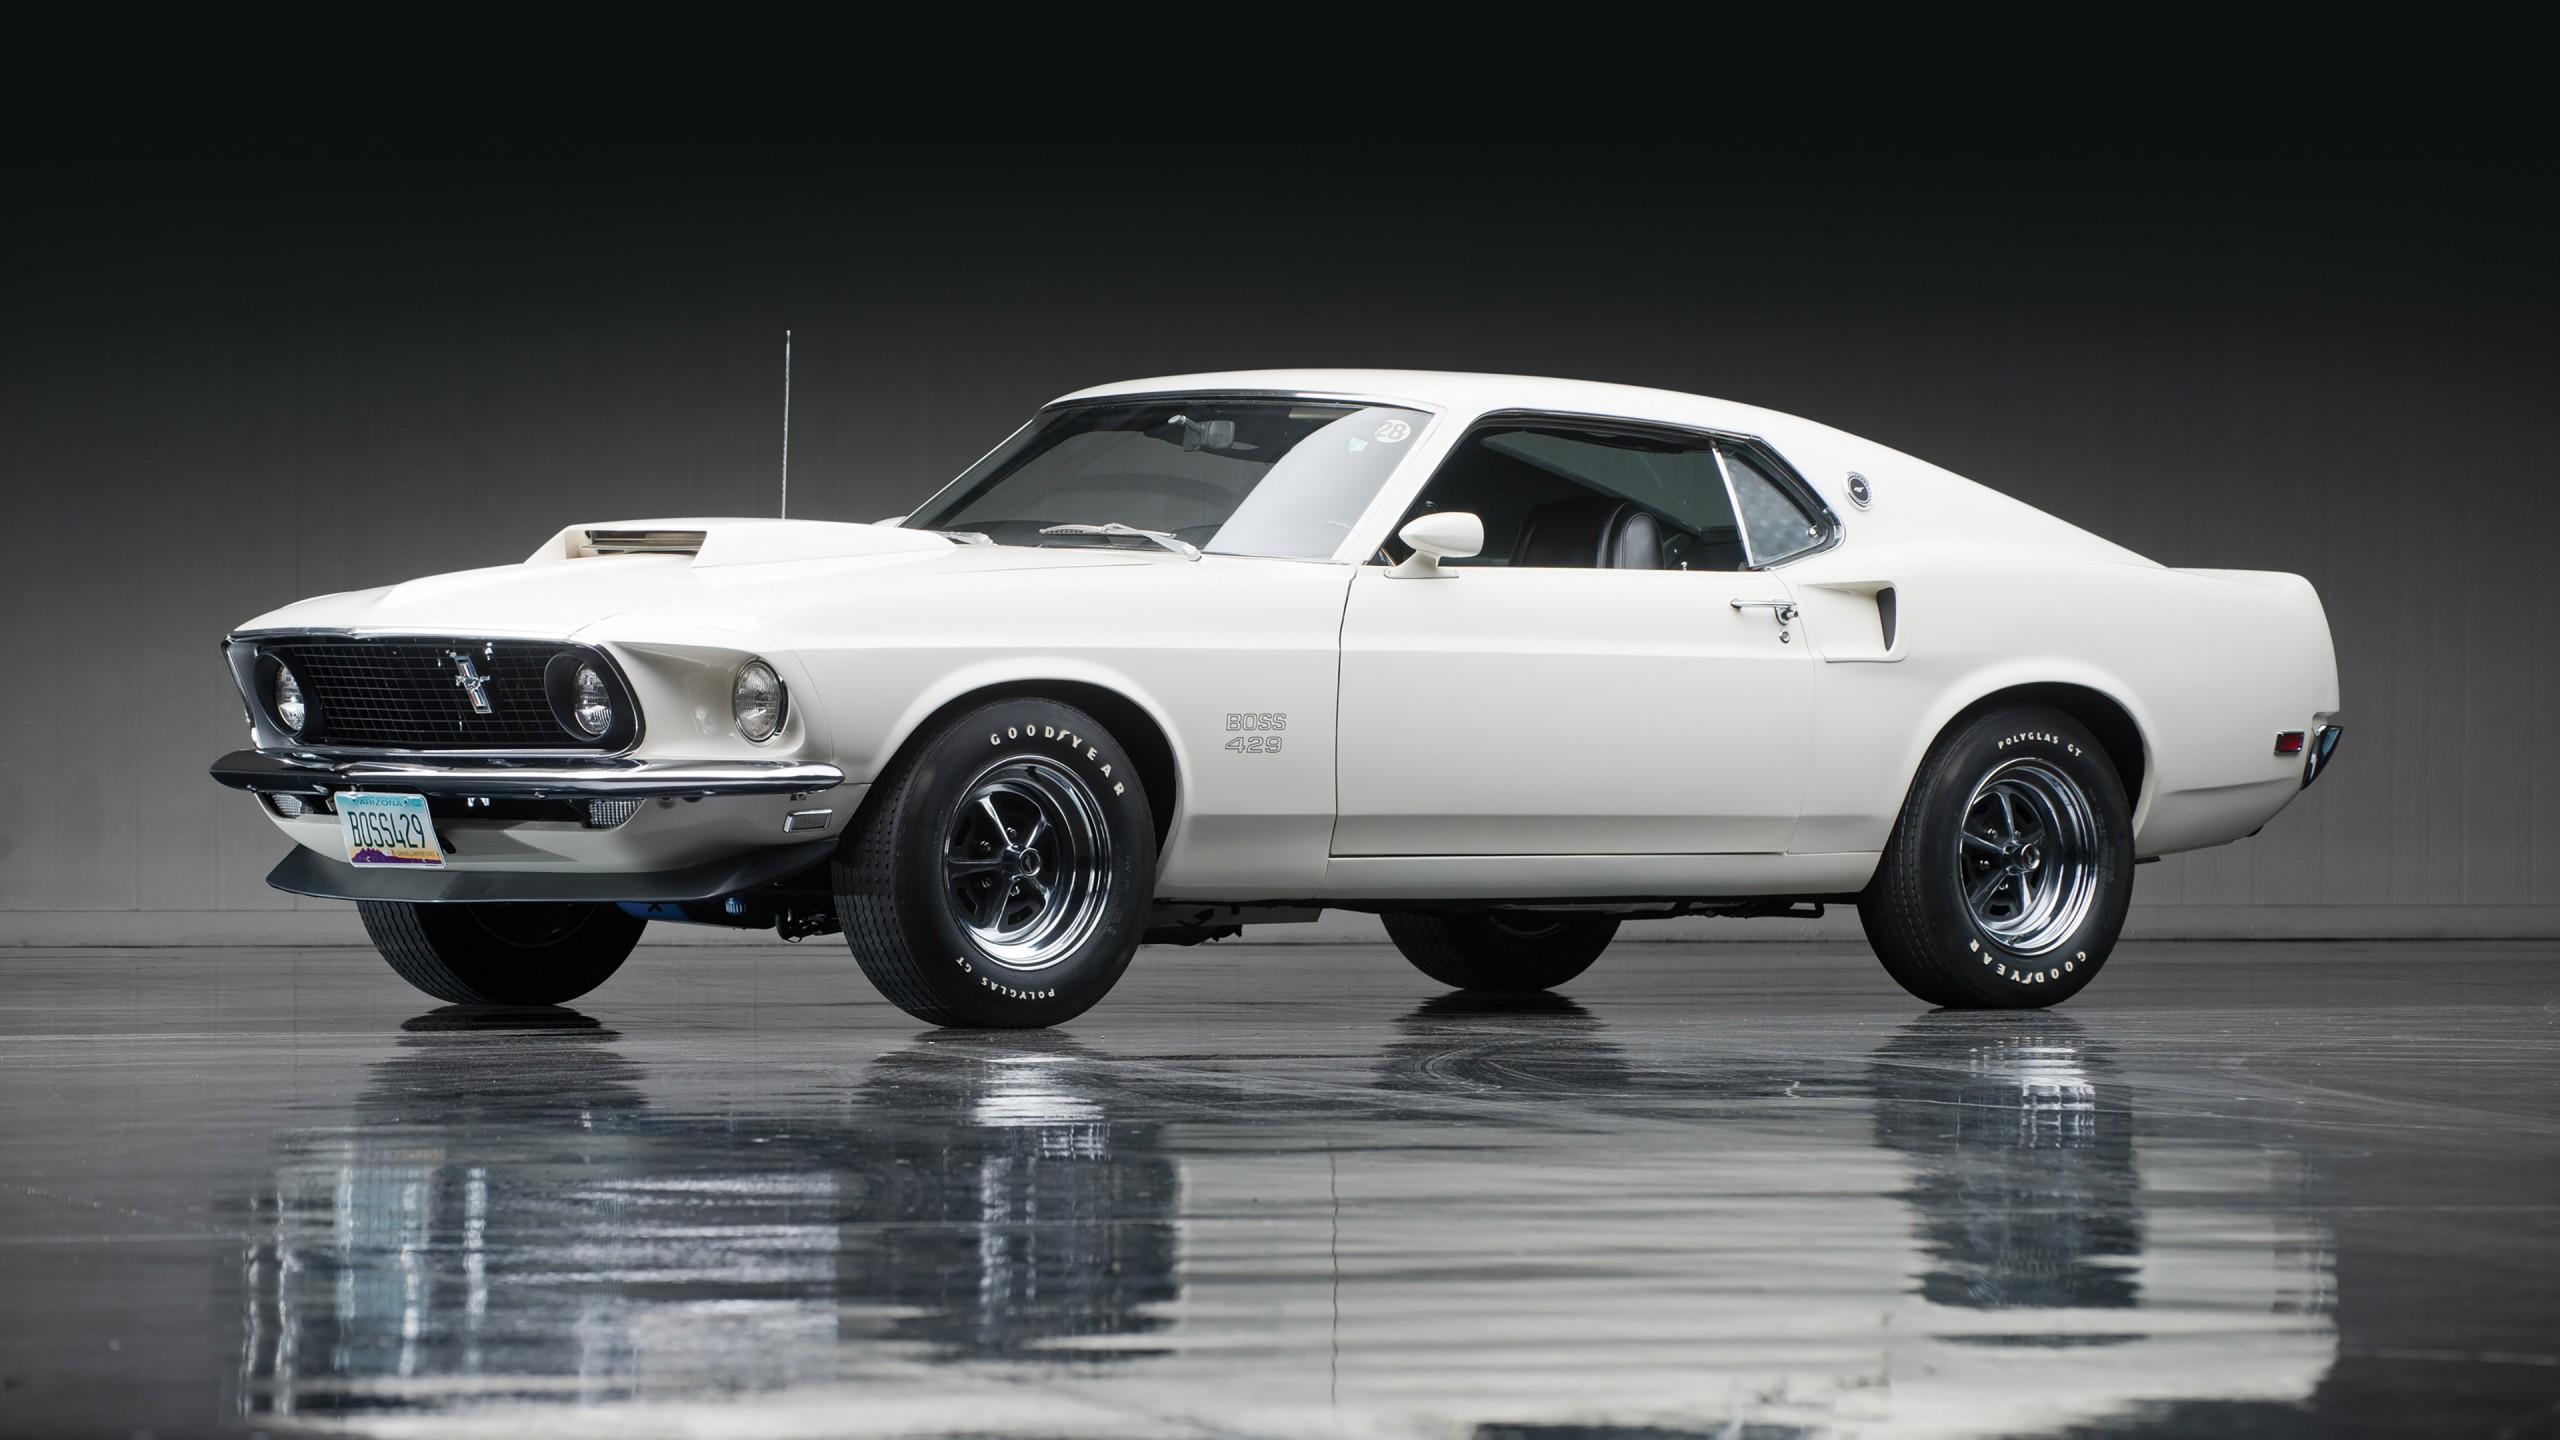 1969 White Ford Mustang Boss 429